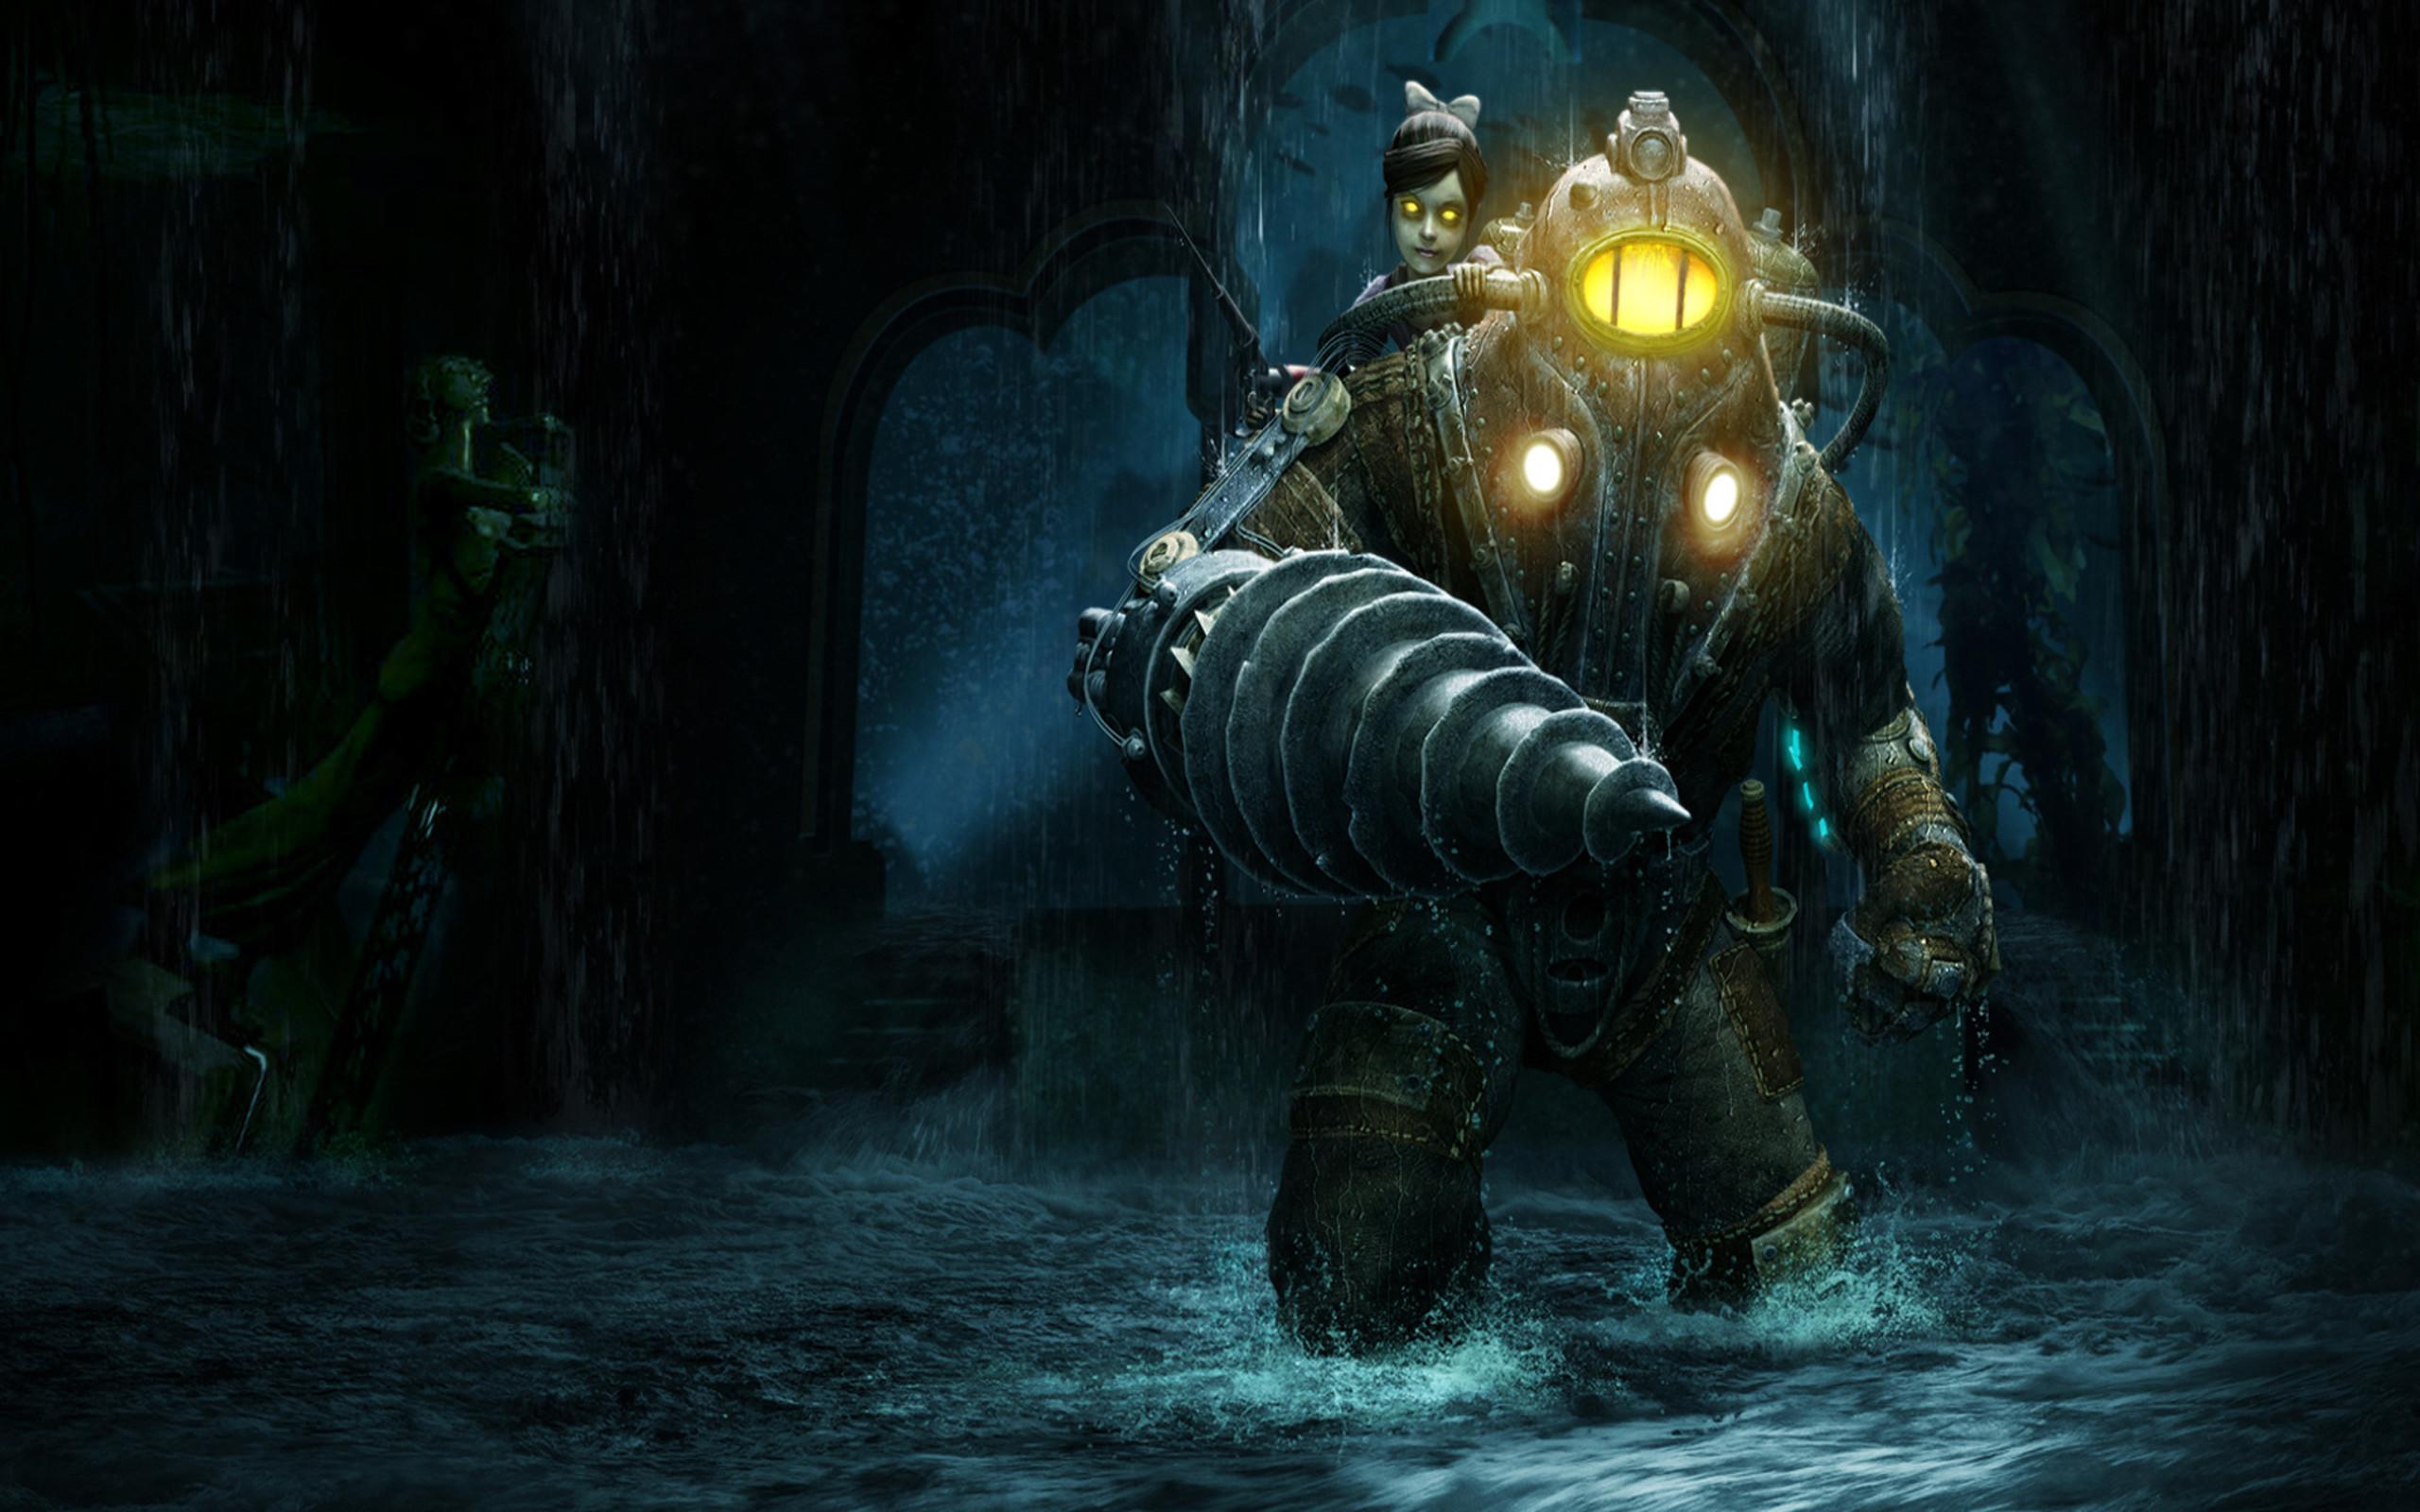 Bioshock 2 Background (80+ images)